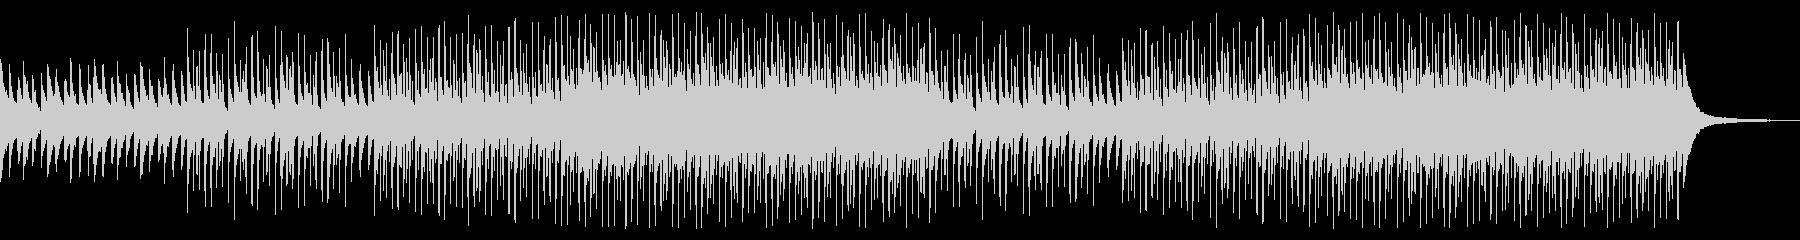 No cymbals Lights Hope Future's unreproduced waveform